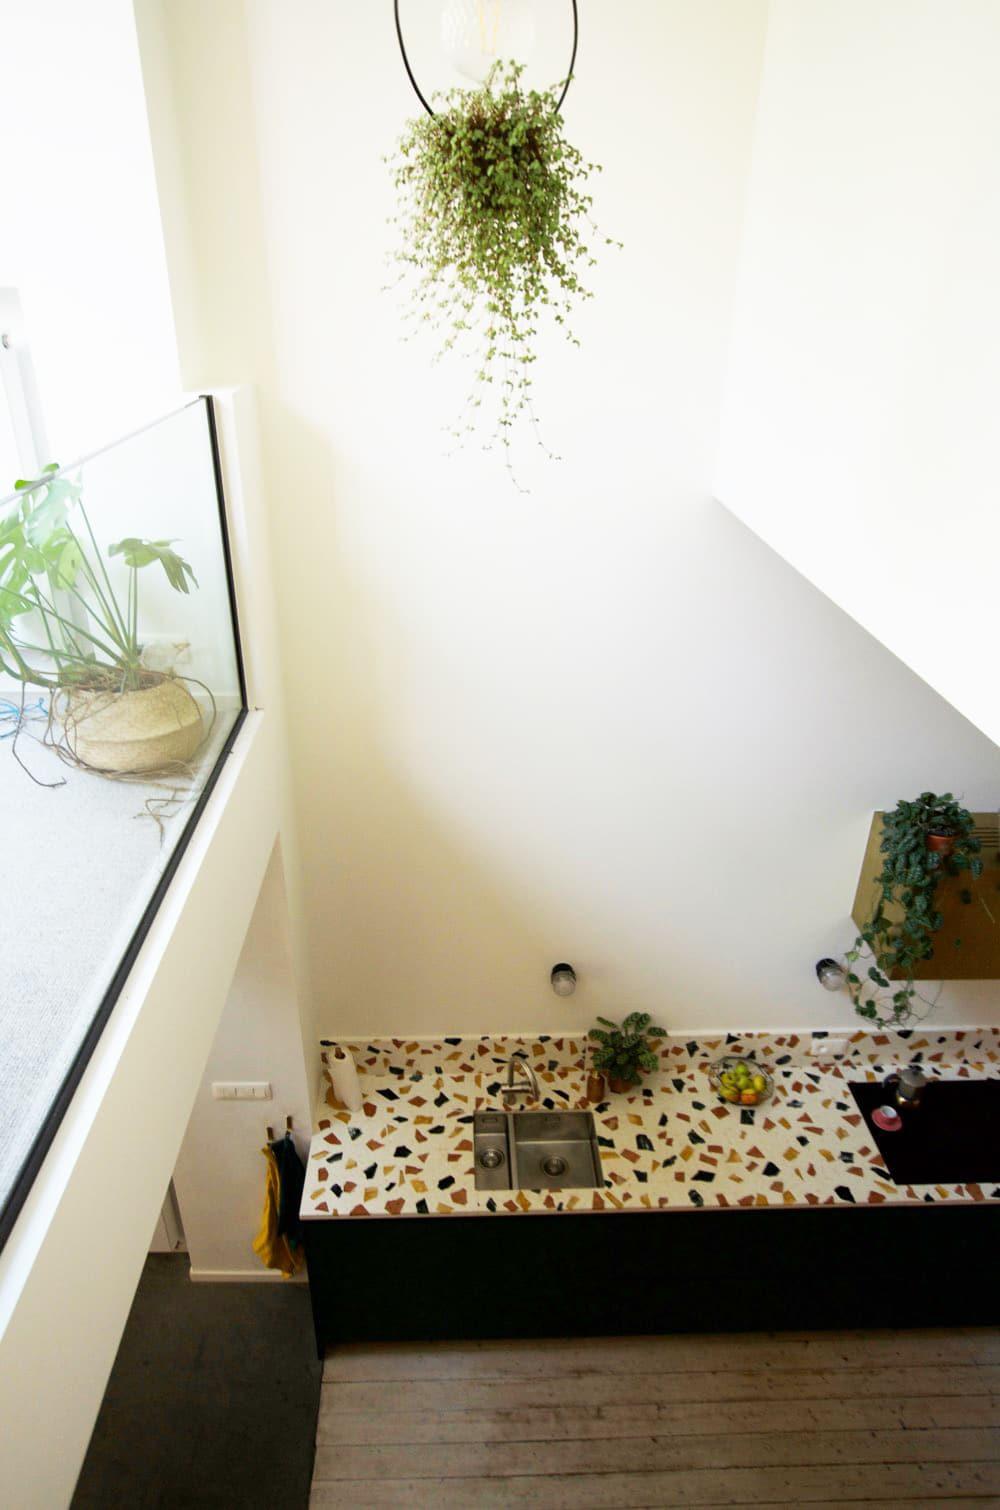 oss 22 | Baeyens & Beck architecten Gent | architect nieuwbouw renovatie interieur | high end | architectenbureau